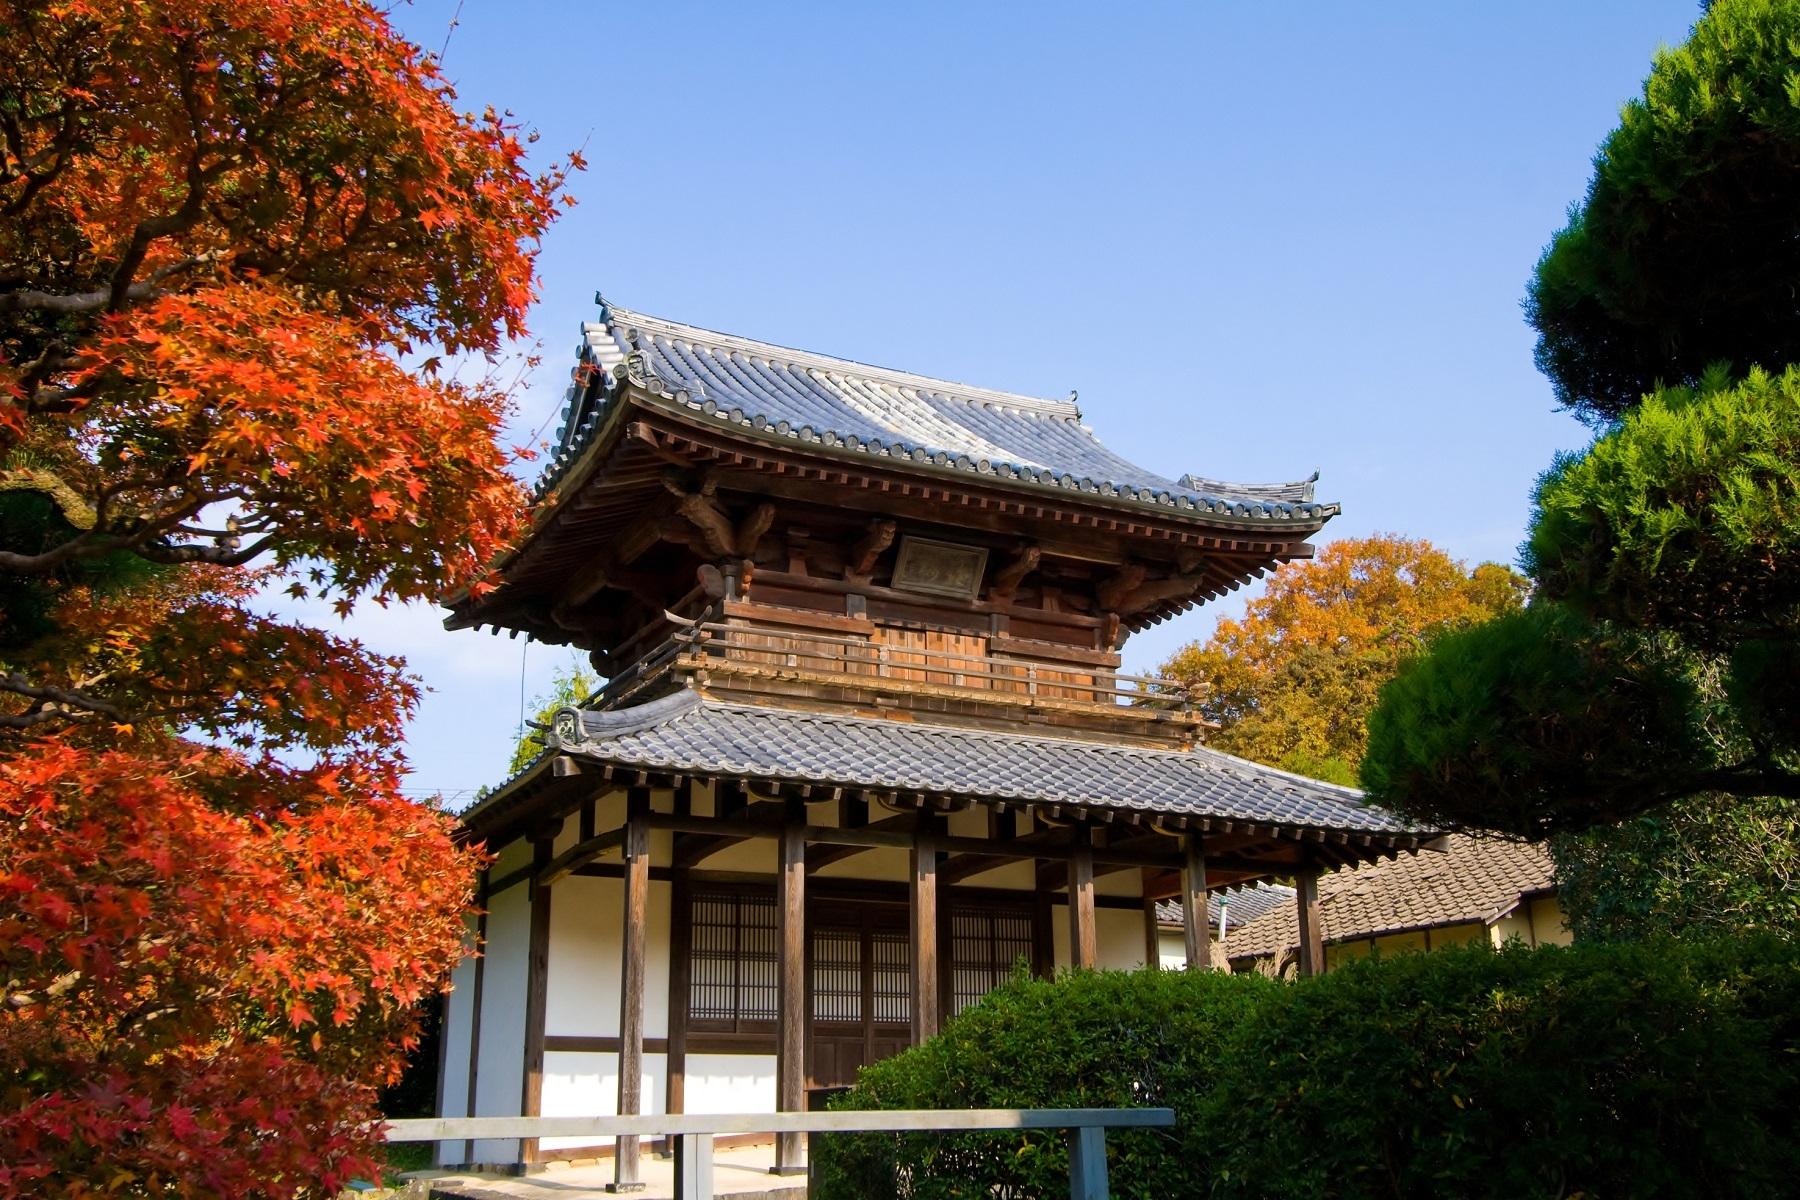 7. Tokoji Temple